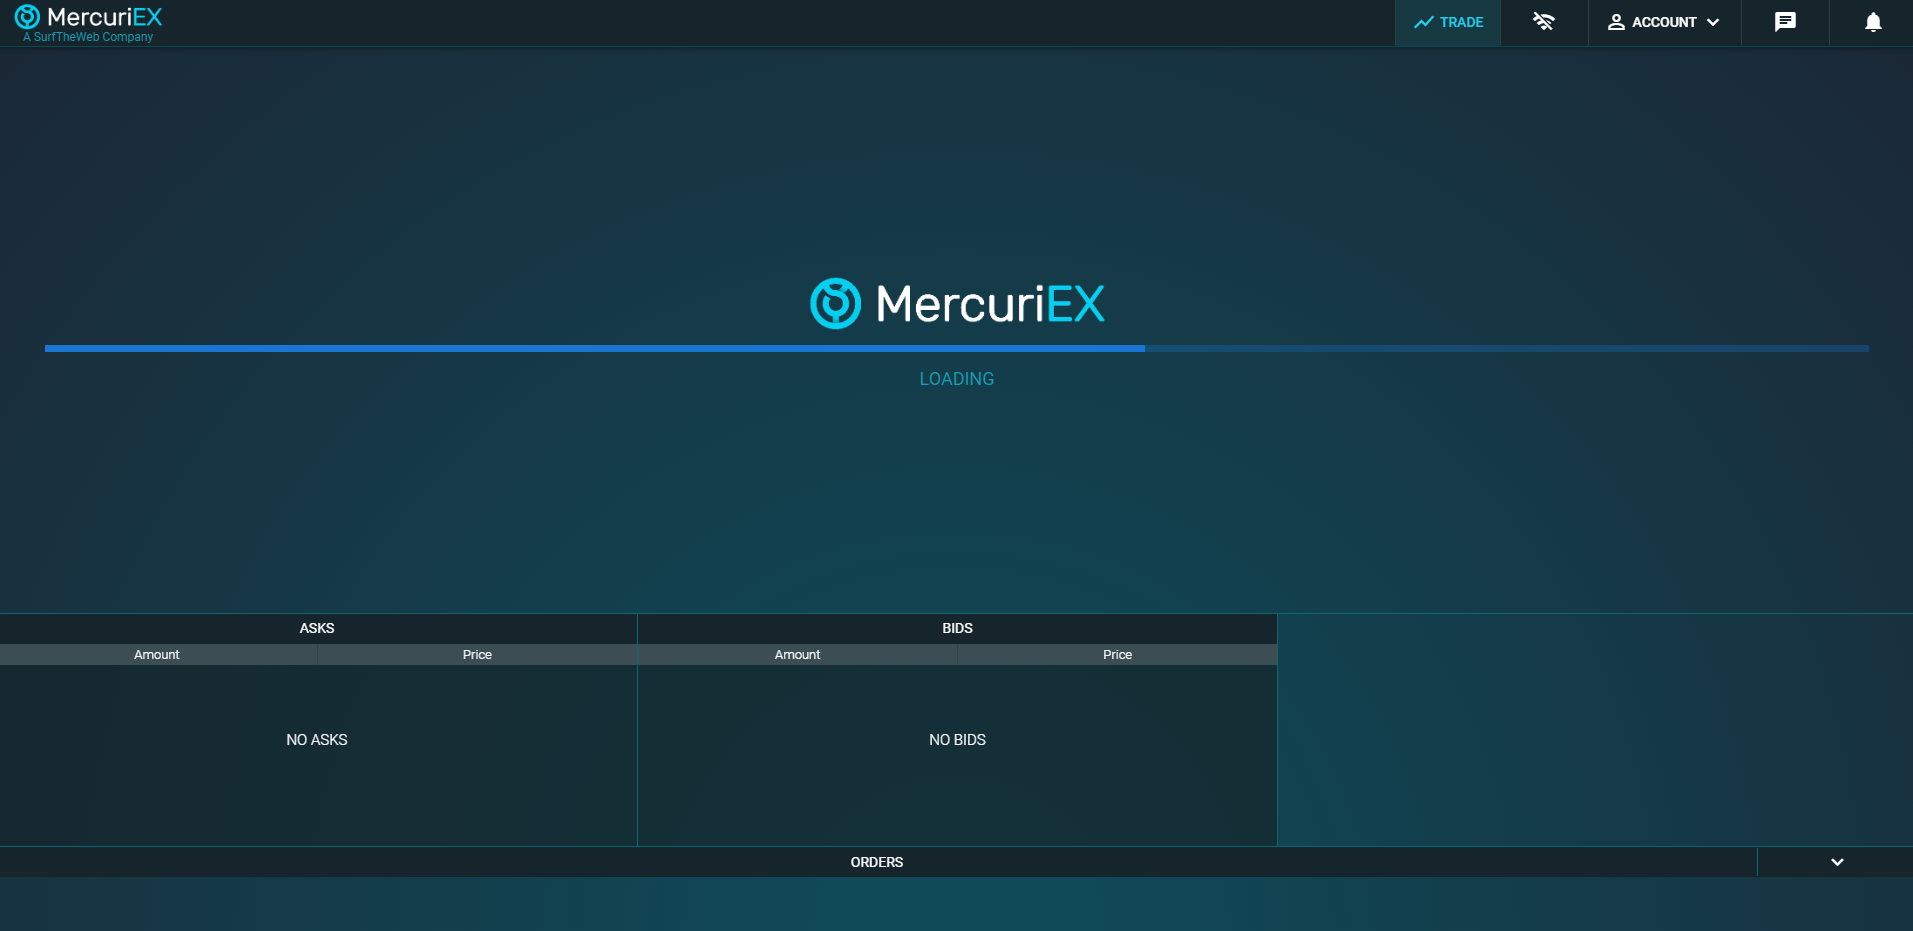 MercuriEx Trading View